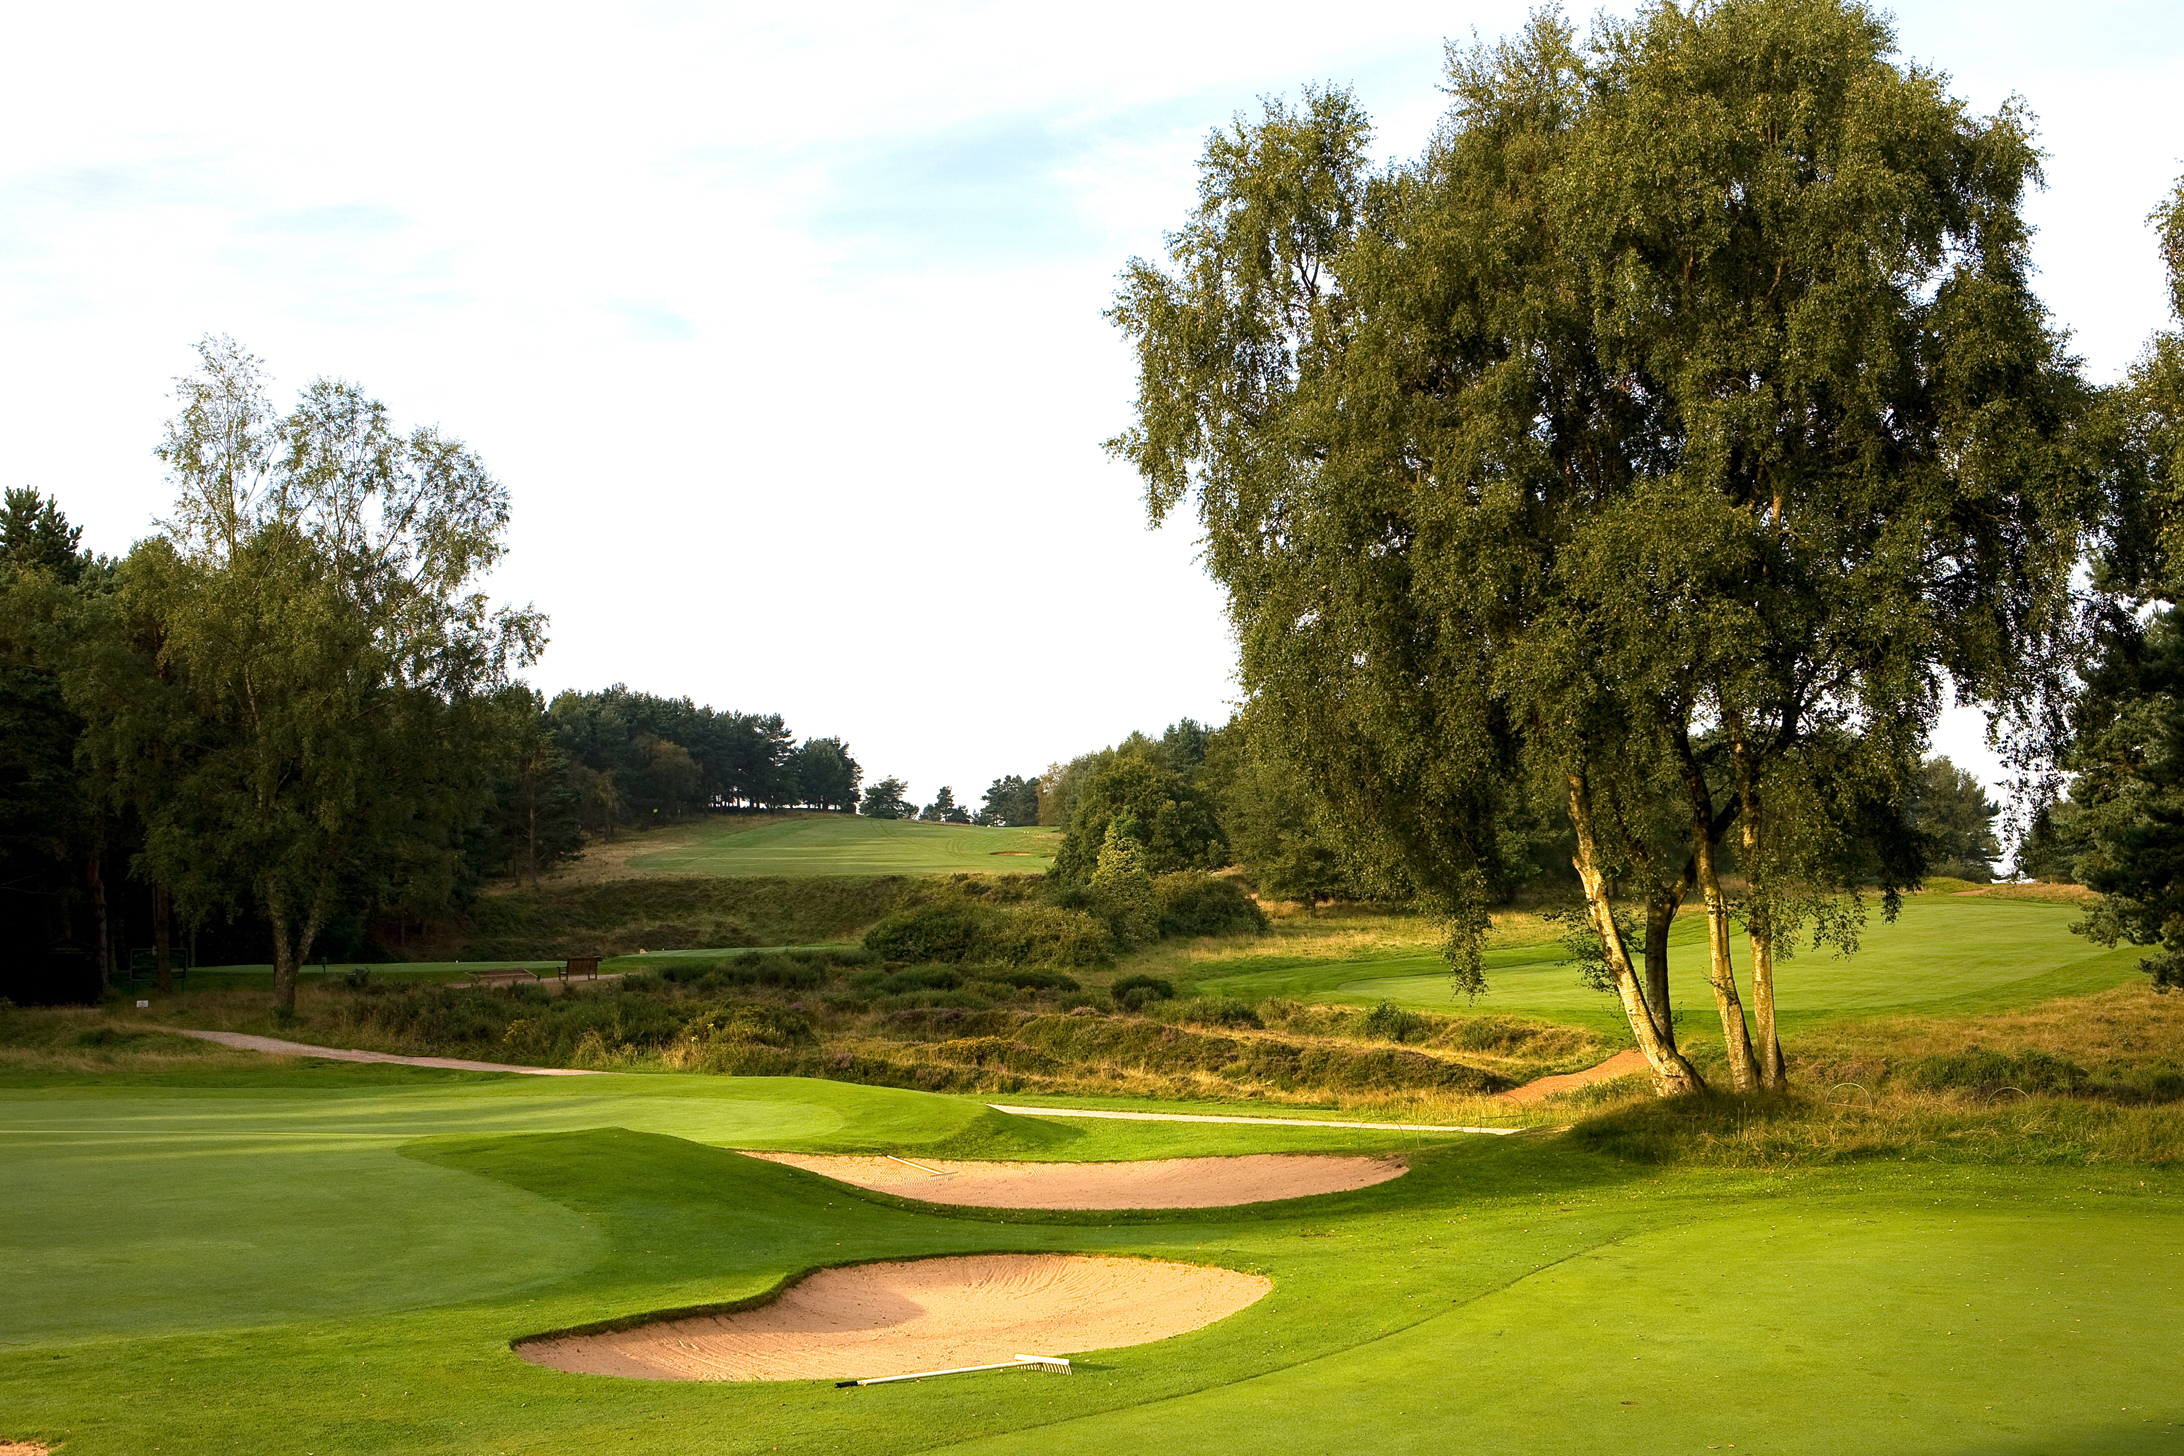 southern mens golf lands - HD2184×1456